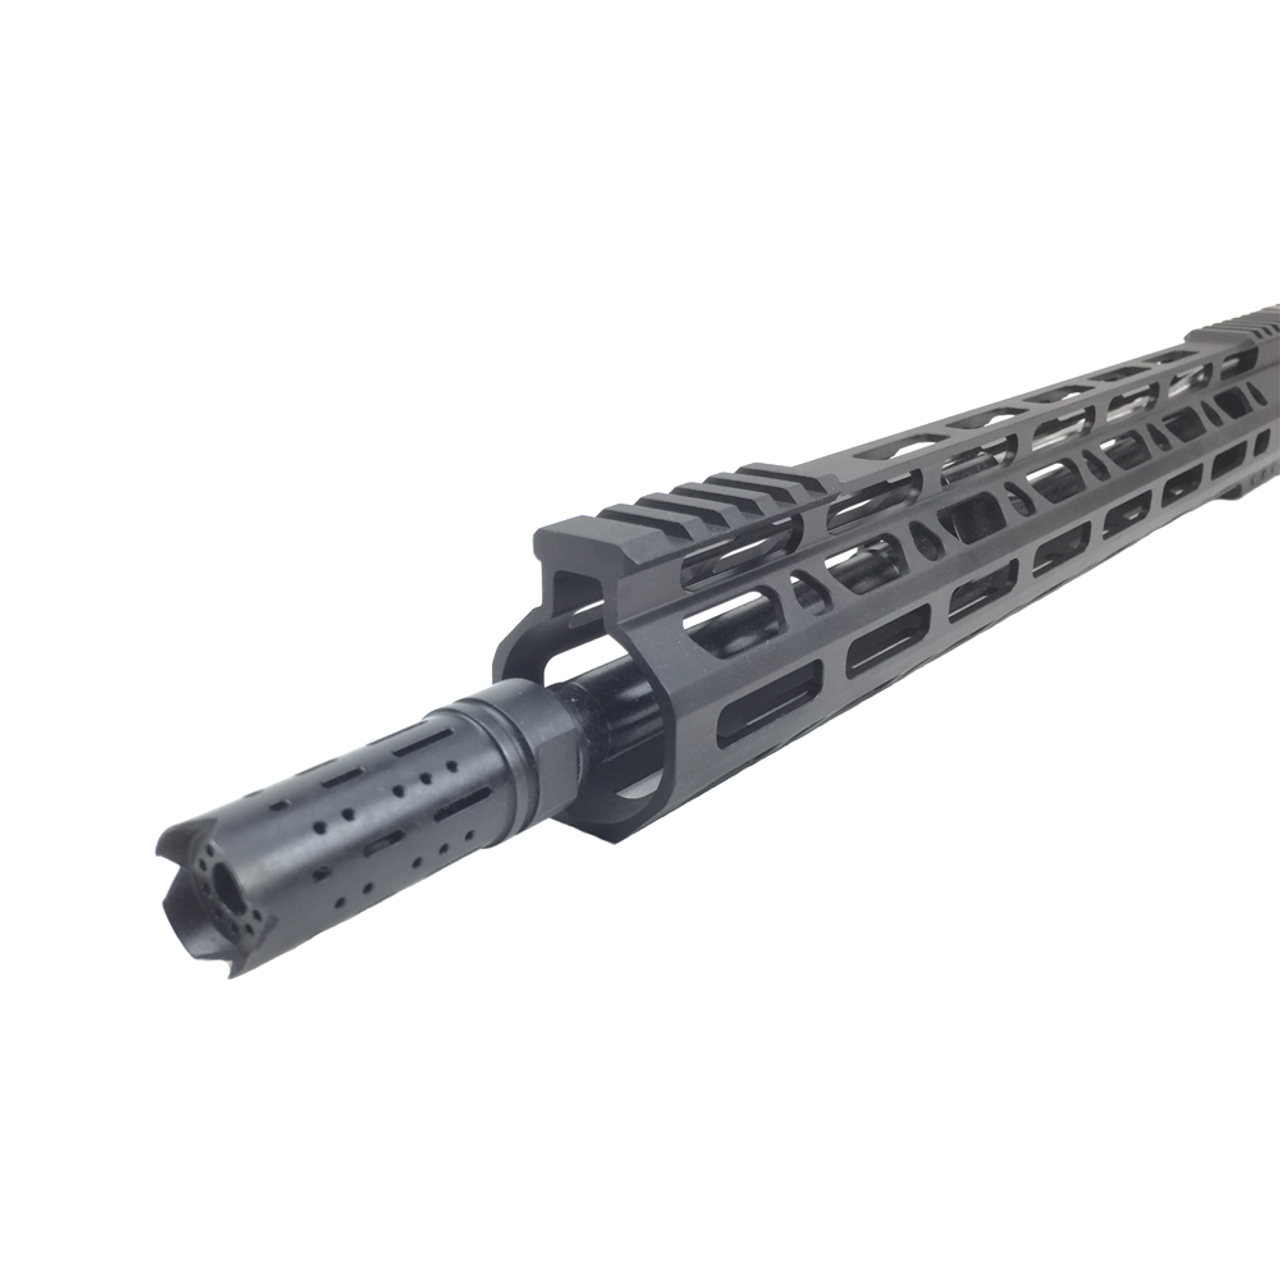 "16"" 5.56 NATO Ultra Light Upper Assembly"